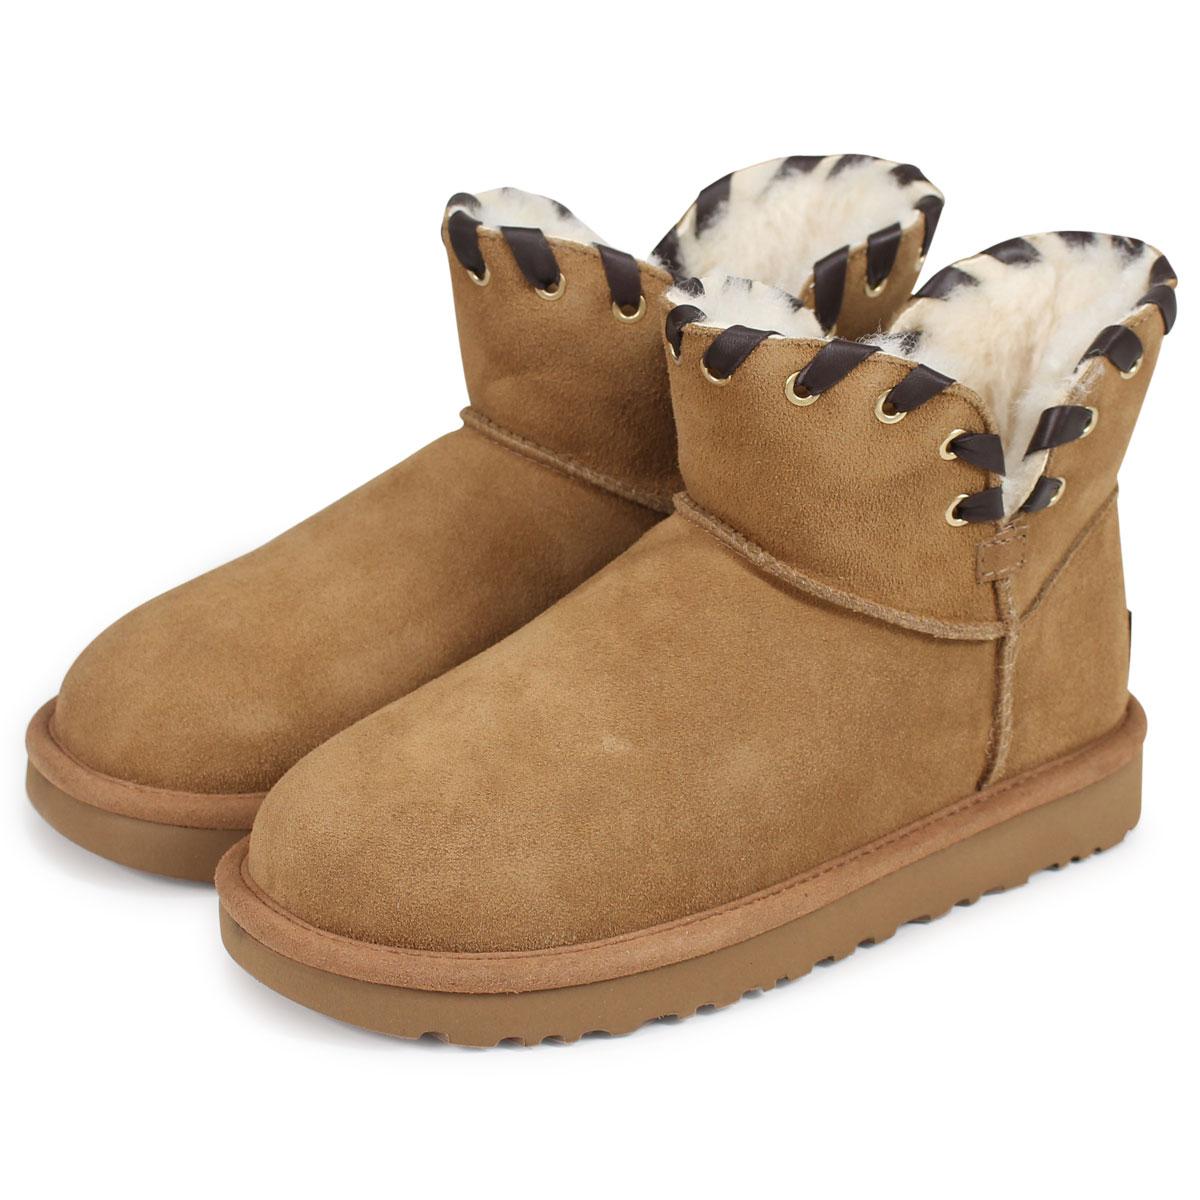 6cb8fbcbf34 UGG WOMENS AIDAH MINI agua Ida mini-mouton boots Lady's 1019644 sheepskin  suede [1711]